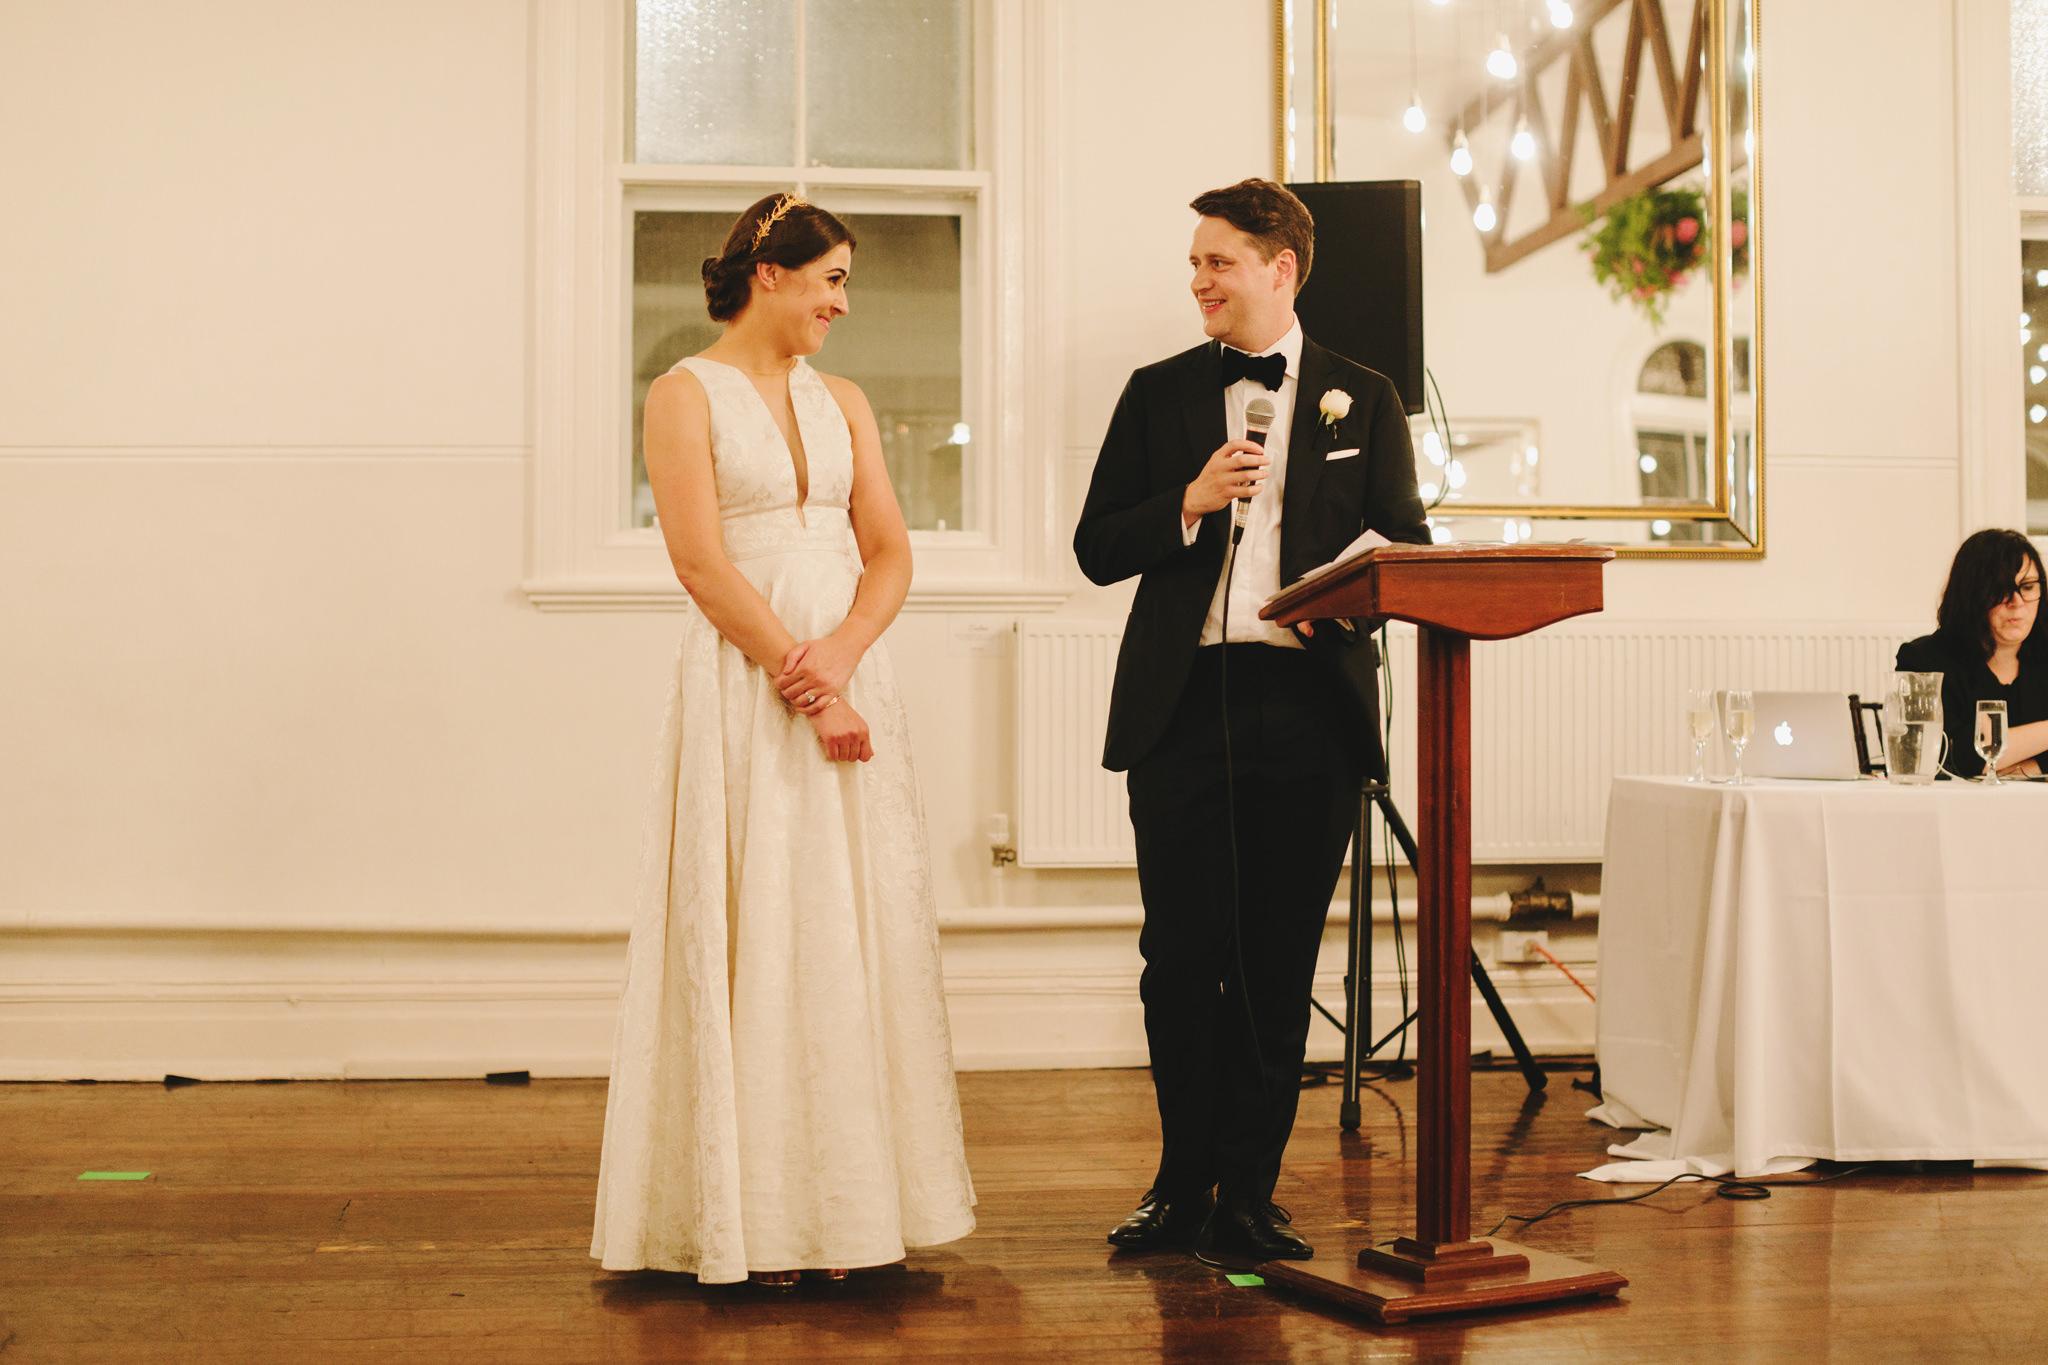 Abbotsford_Convent_Wedding_Peter_Anna132.JPG